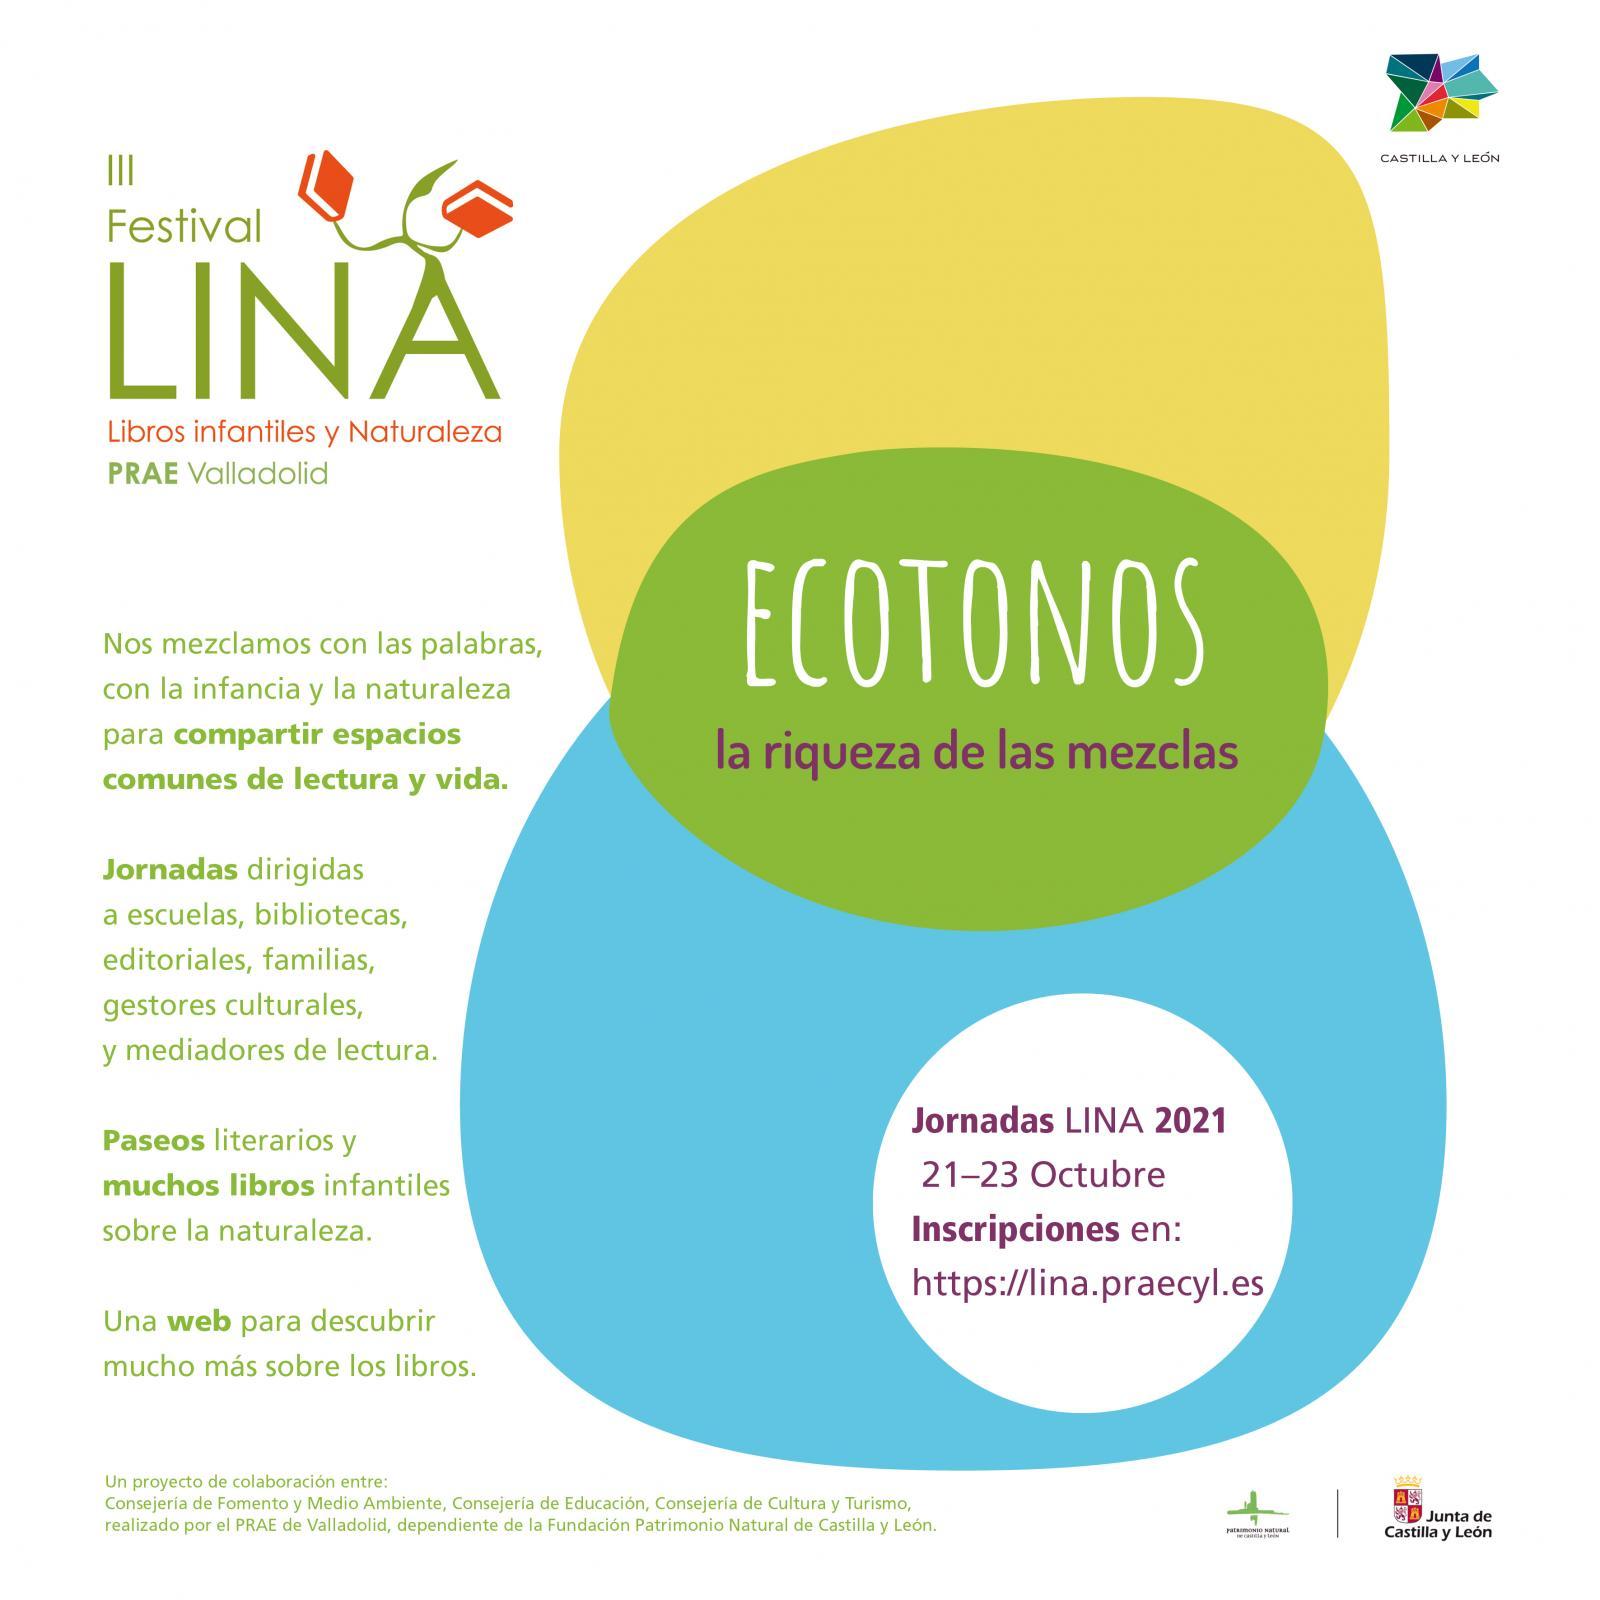 Tercera Edición del LINA, Festival de Literatura Infantil y Naturaleza